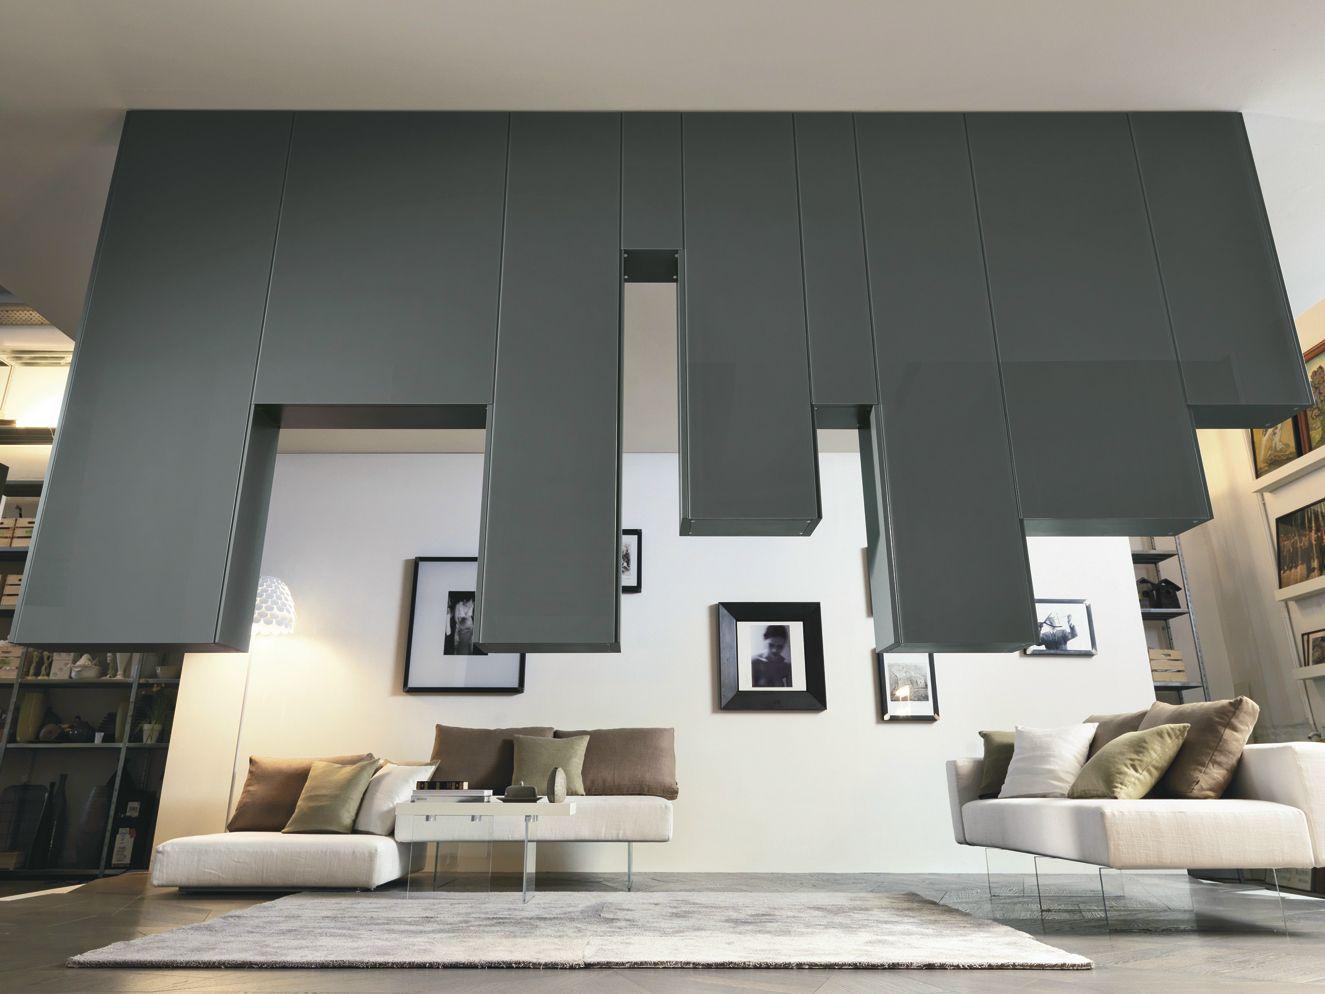 Mueble modular de pared divisorio montaje pared 30mm / LAGOLINEA ...